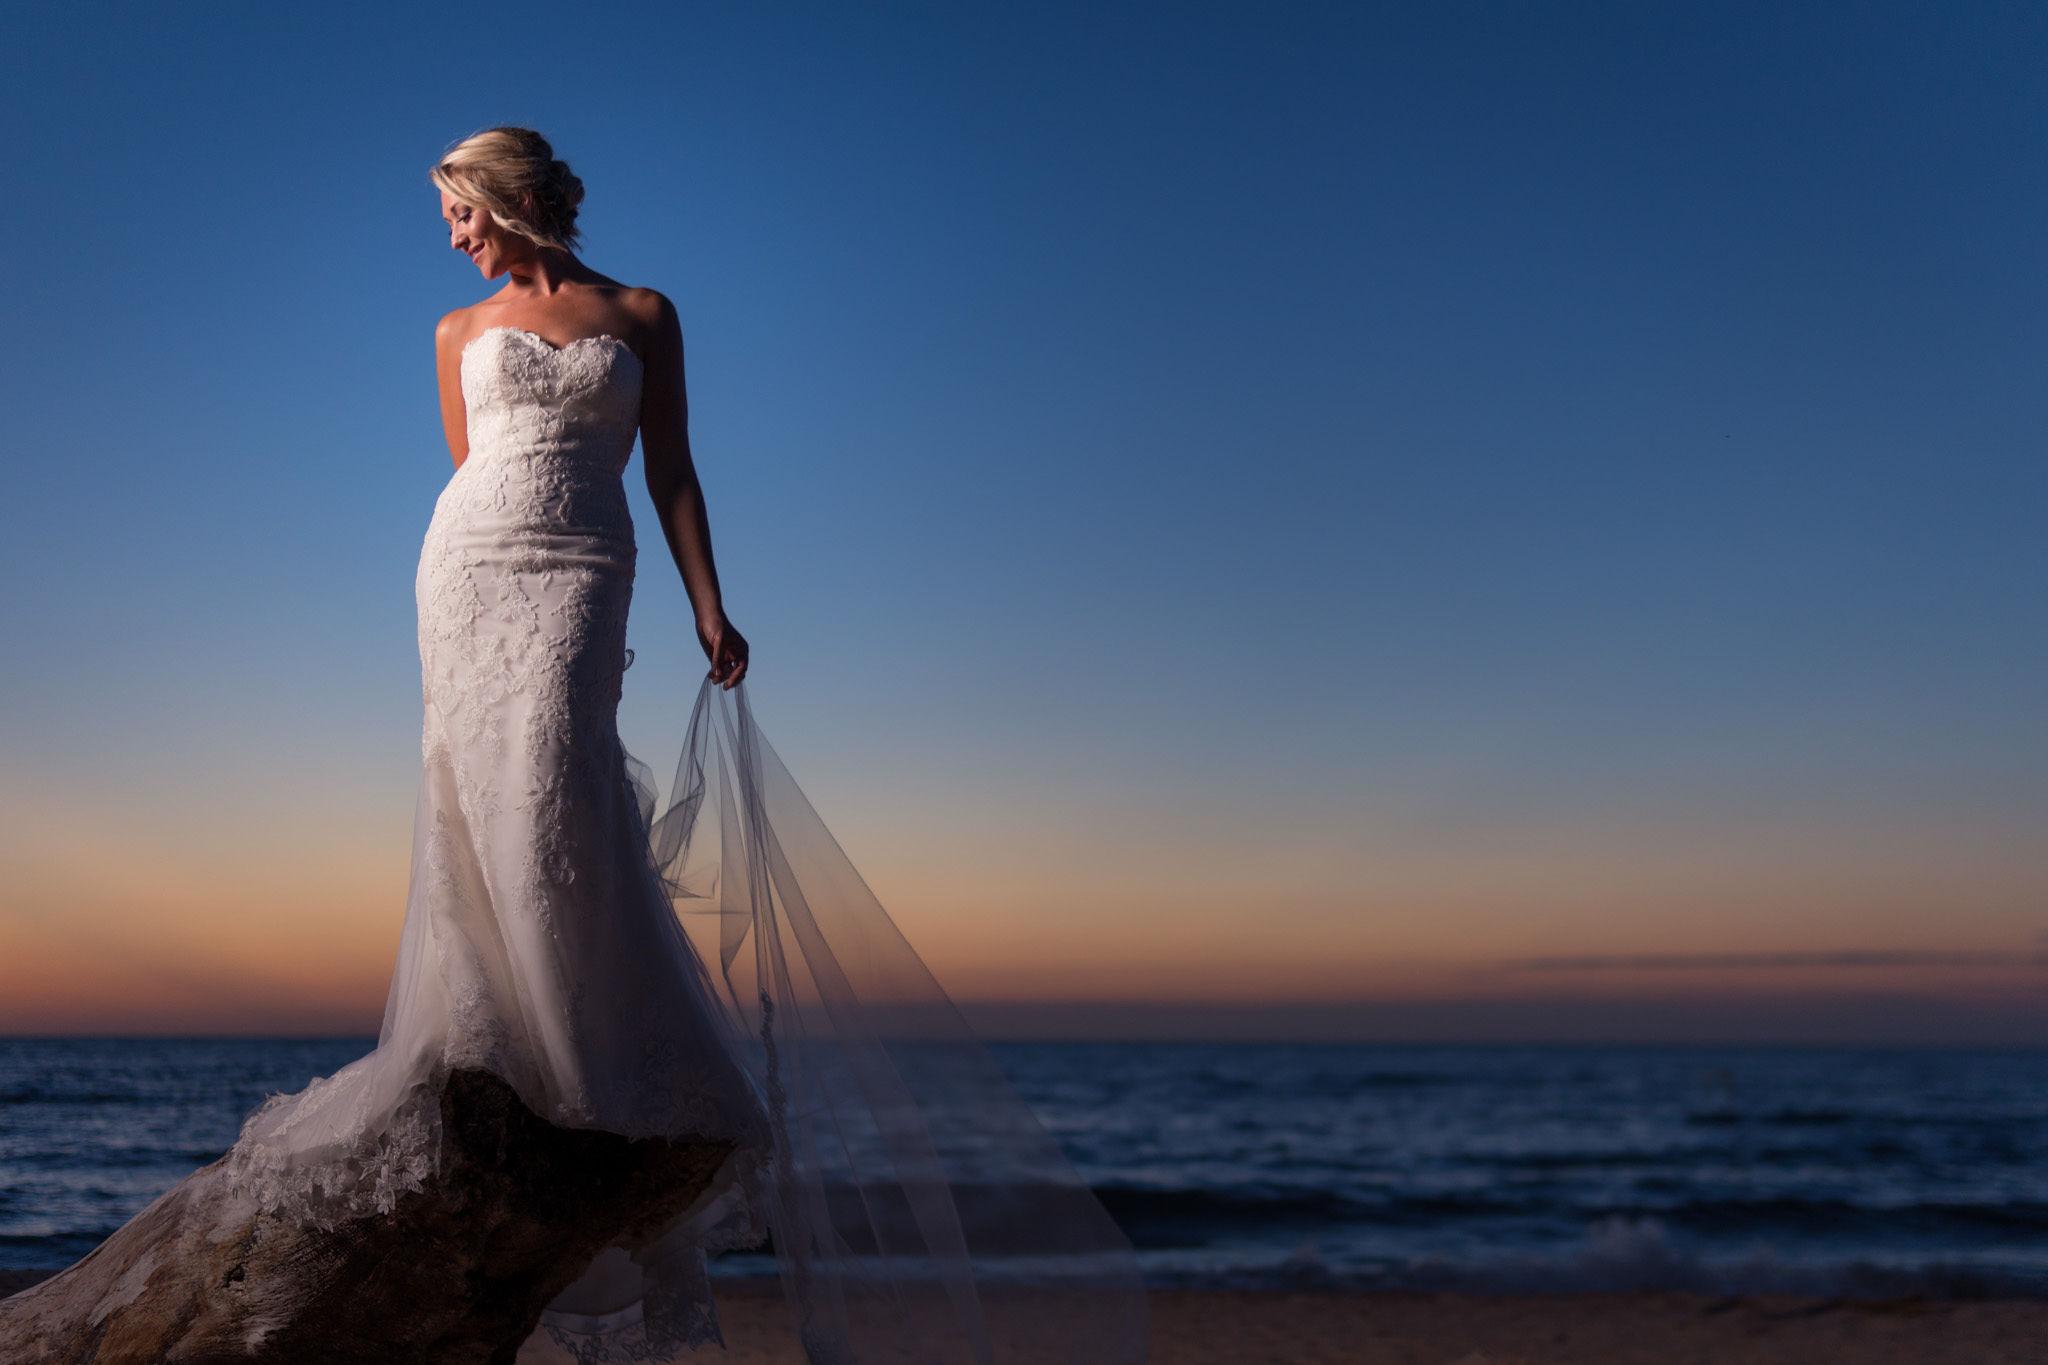 Amber's Bridal Portrait Session | Chicago Wedding Photographer-27.jpg